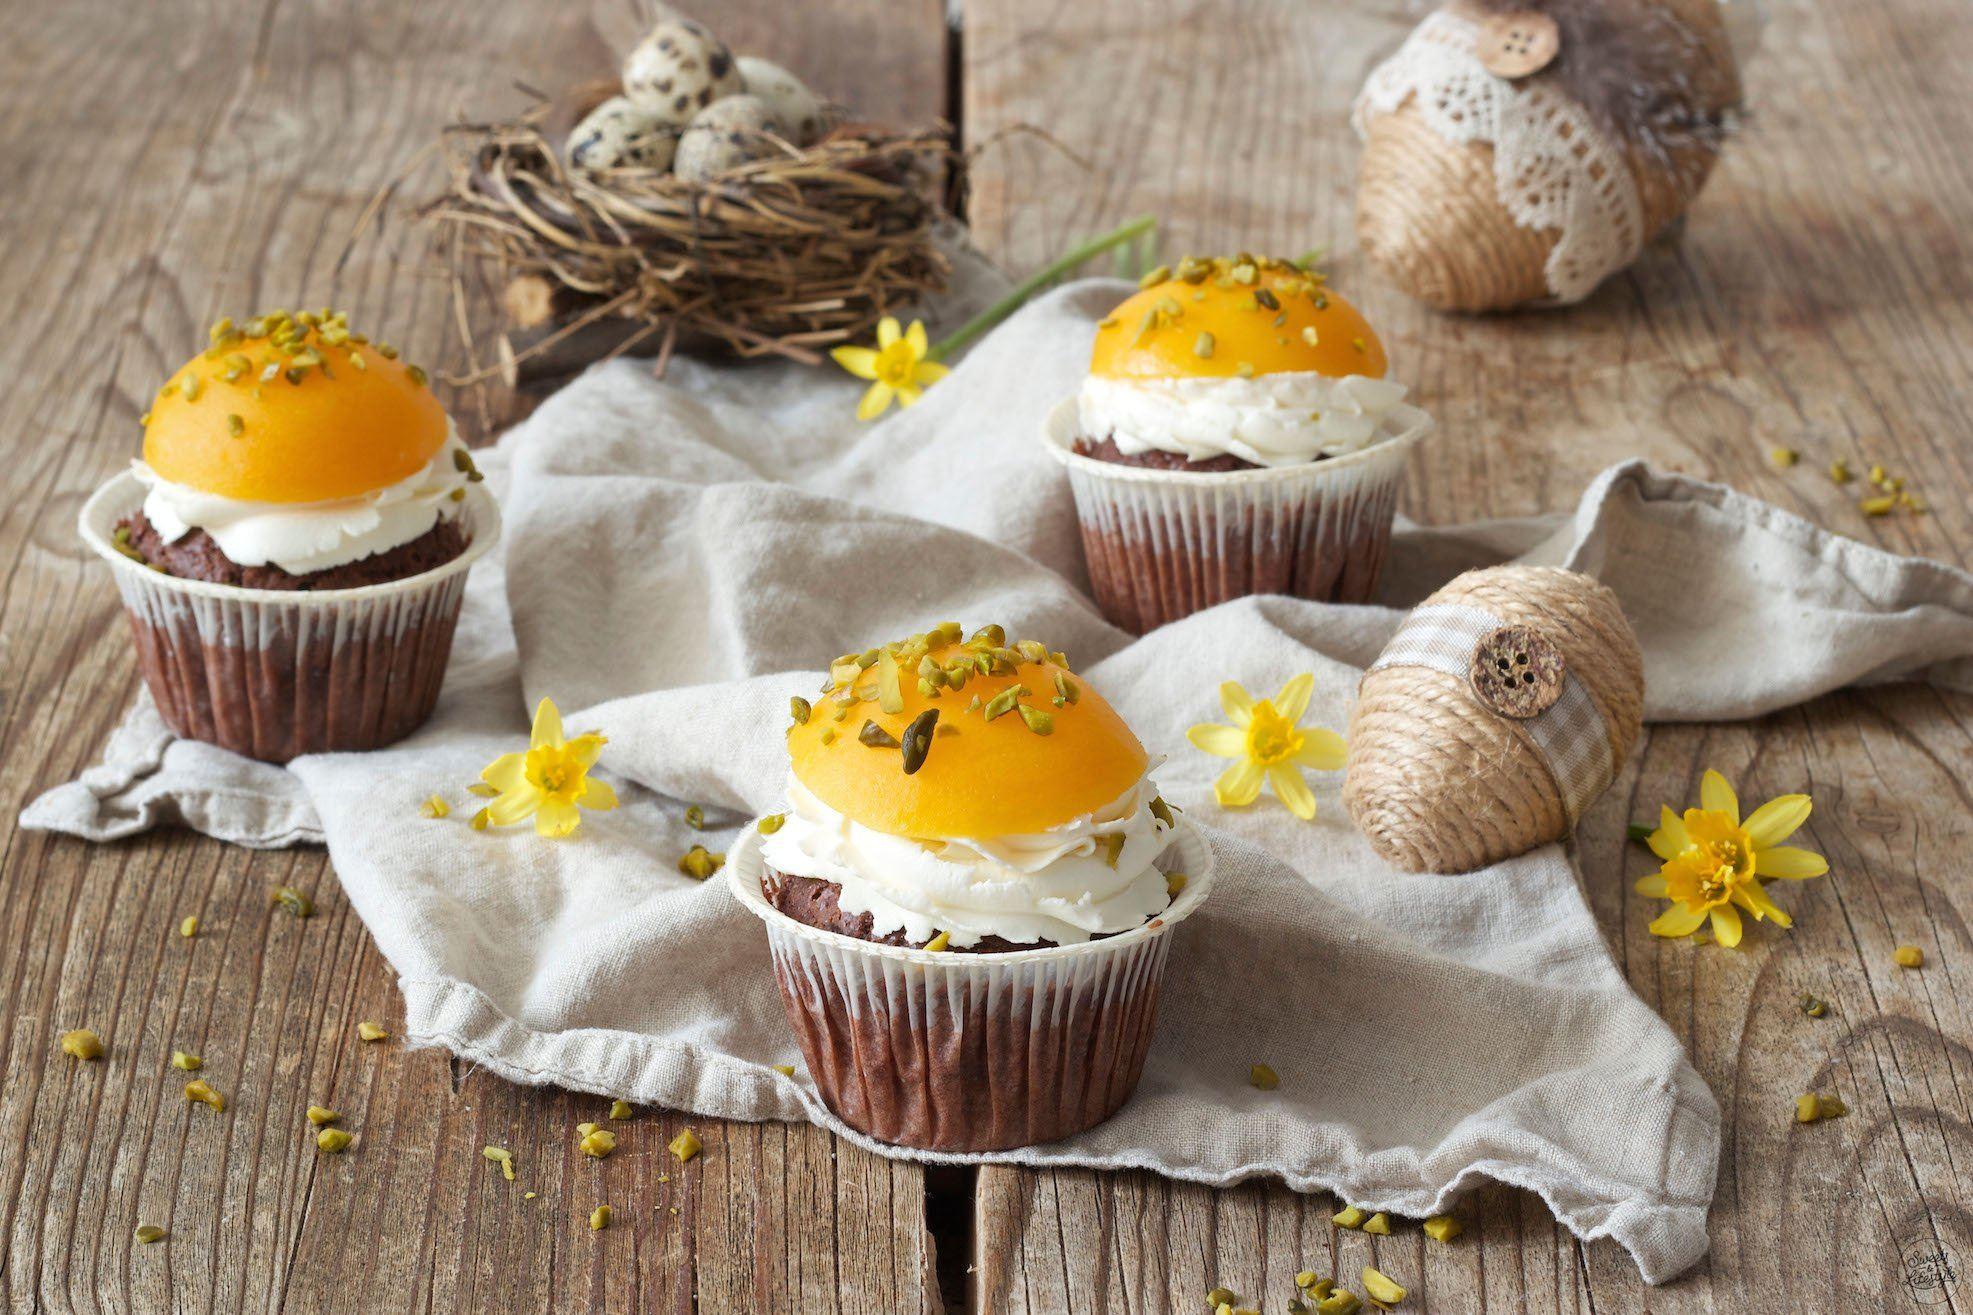 Spiegelei Cupcakes Ostercupcakes Sweets Lifestyle